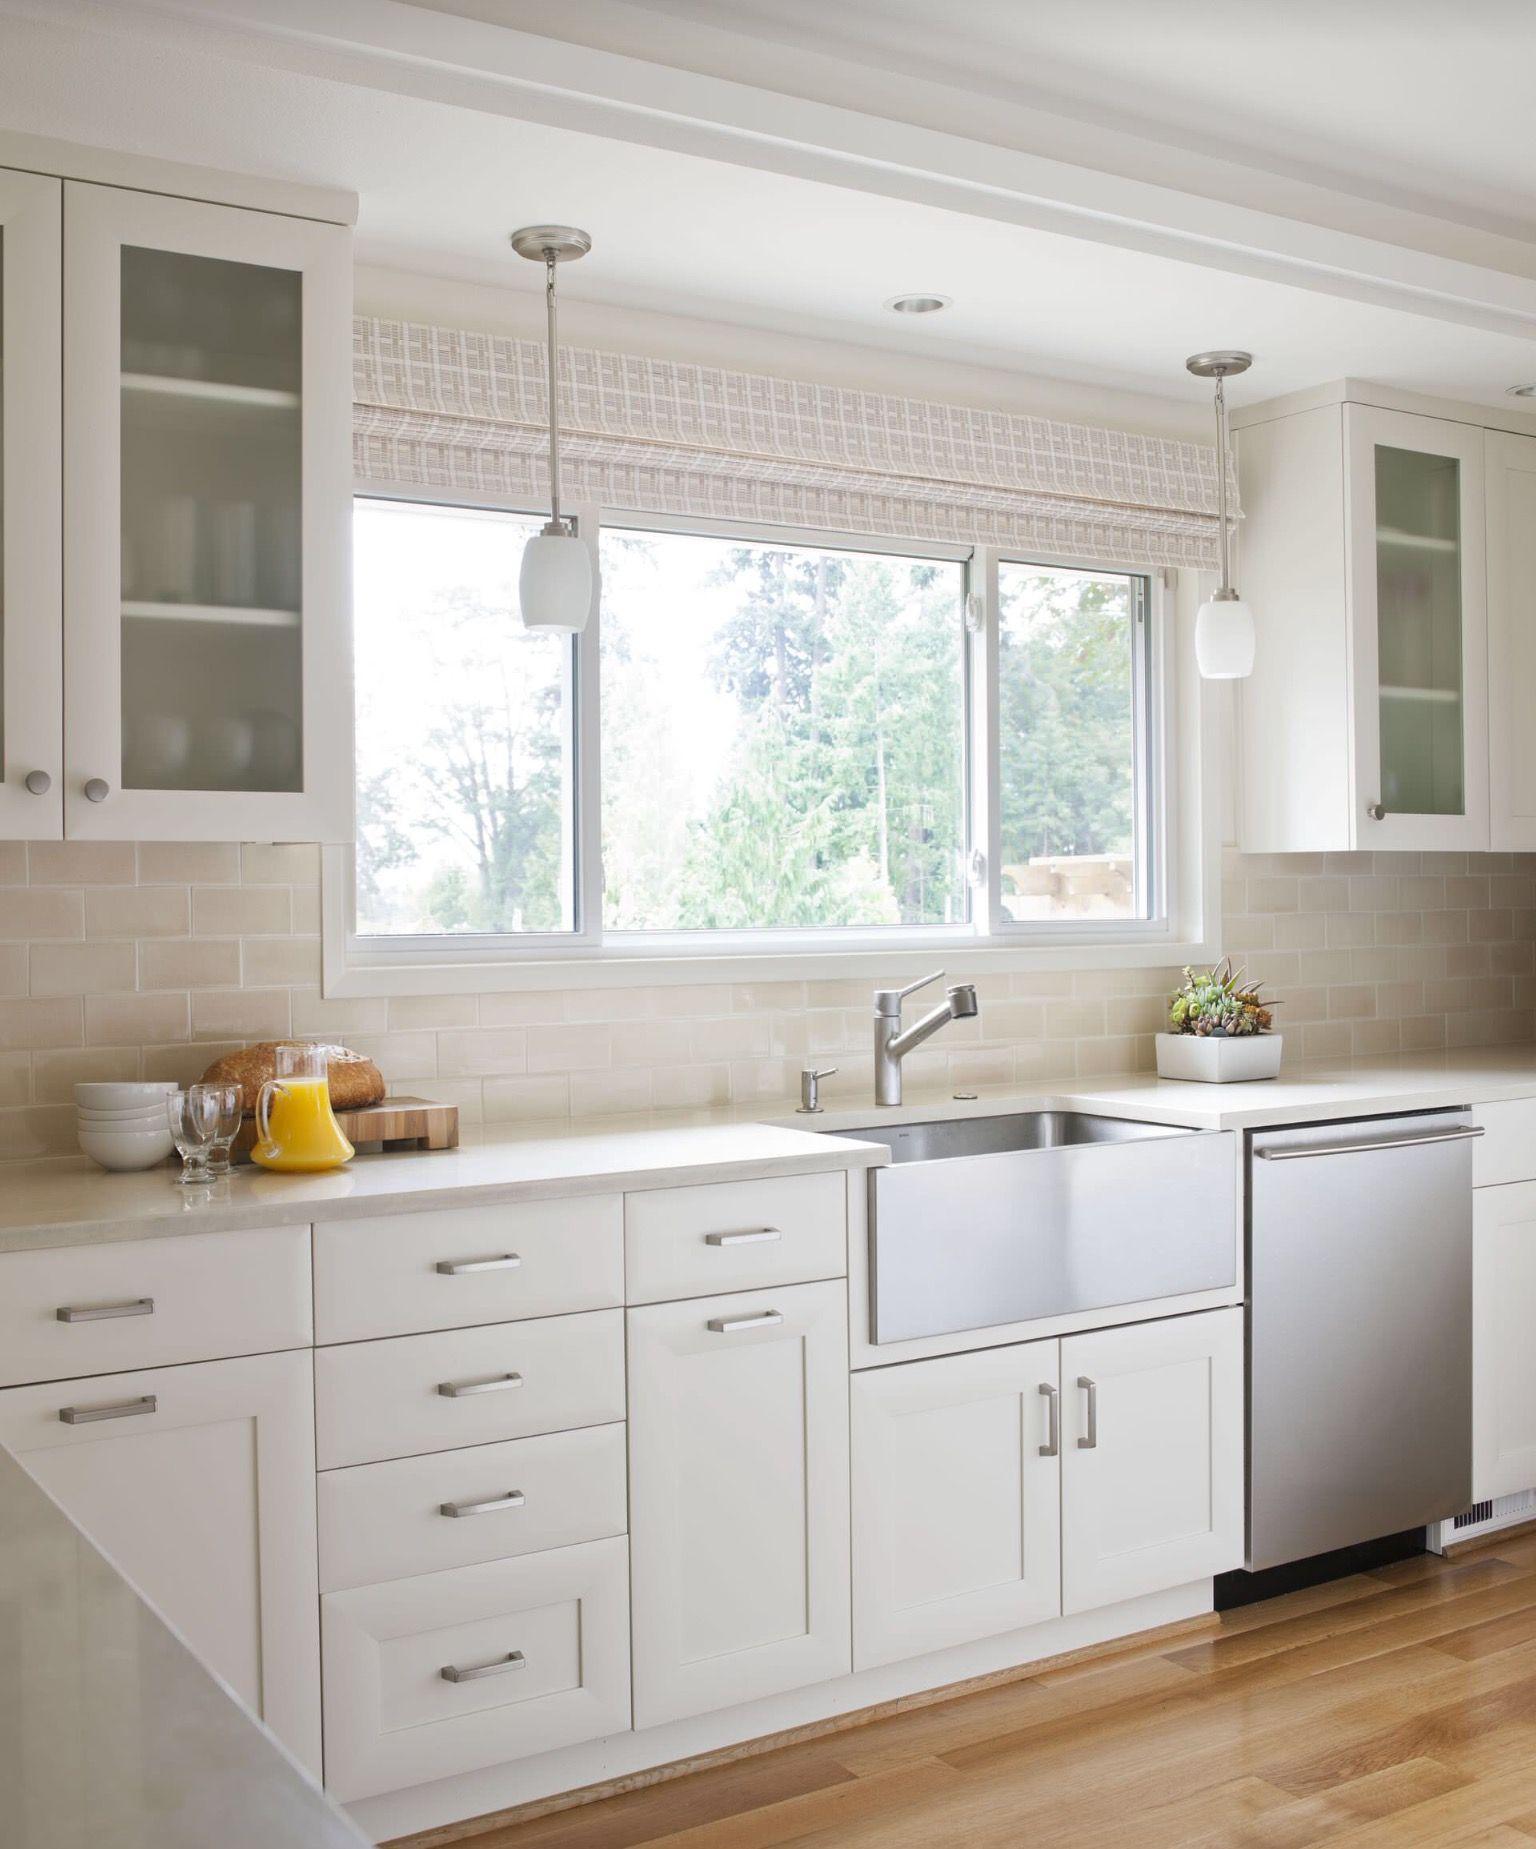 Pin by becky thompson on kitchenhouse ideas pinterest kitchens